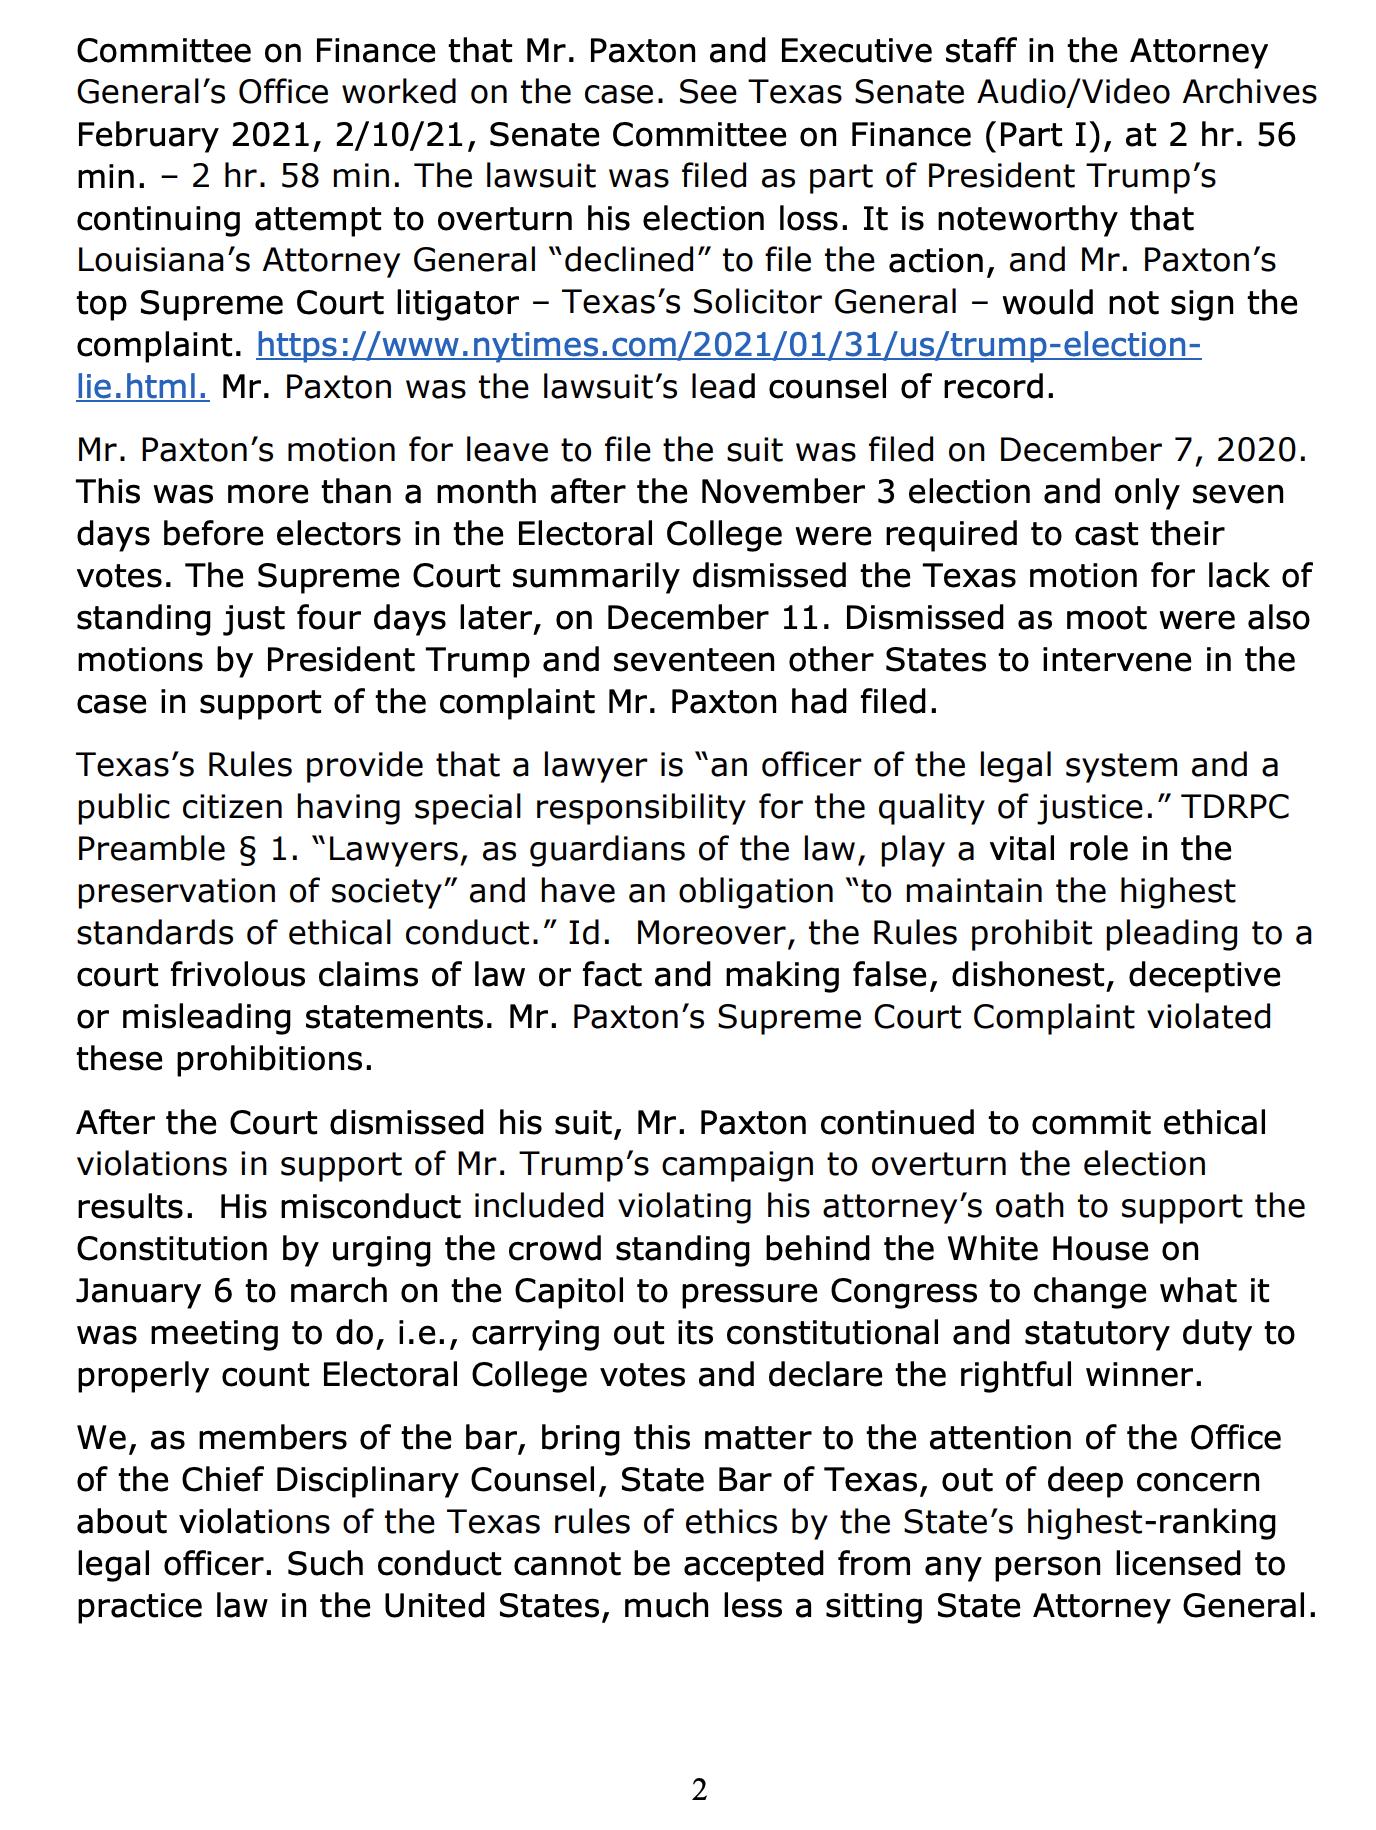 Screen-Shot-2021-08-31-at-10.02.30-AM Texas State Bar Puts AG Ken Paxton Under Immediate Investigation Crime Donald Trump Featured Politics Top Stories